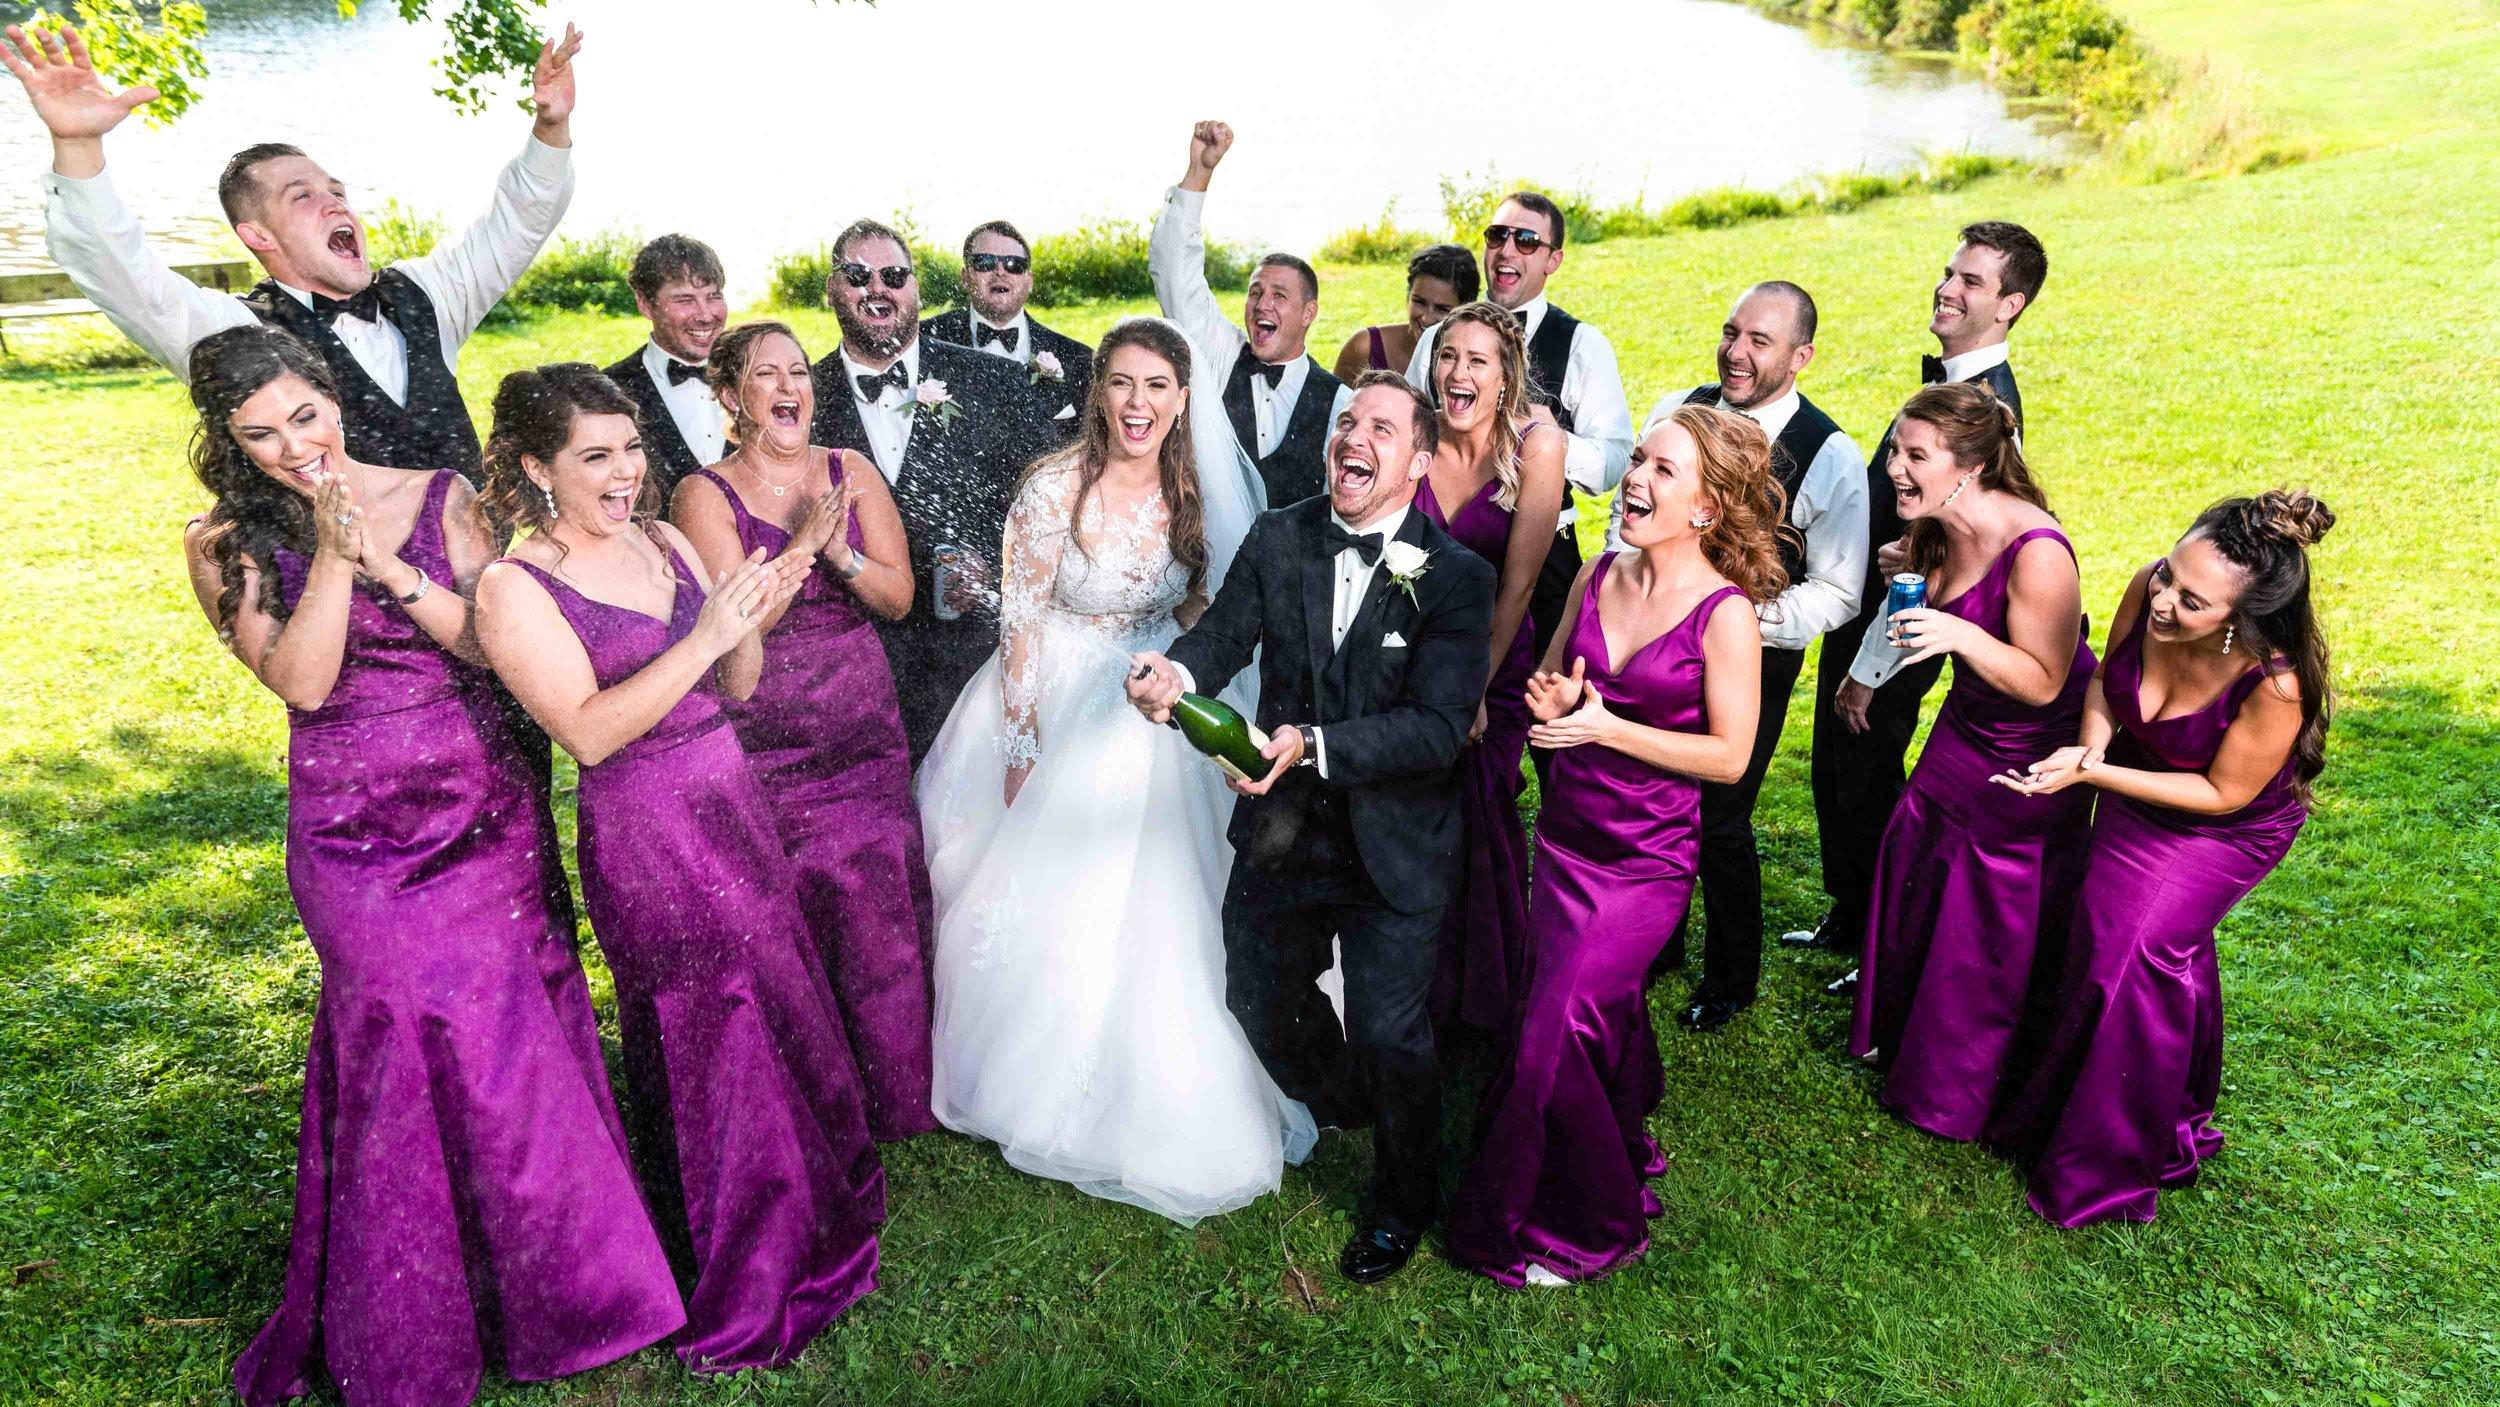 Wedding-North-Park-Bridal-Party-Portraits-8.jpg